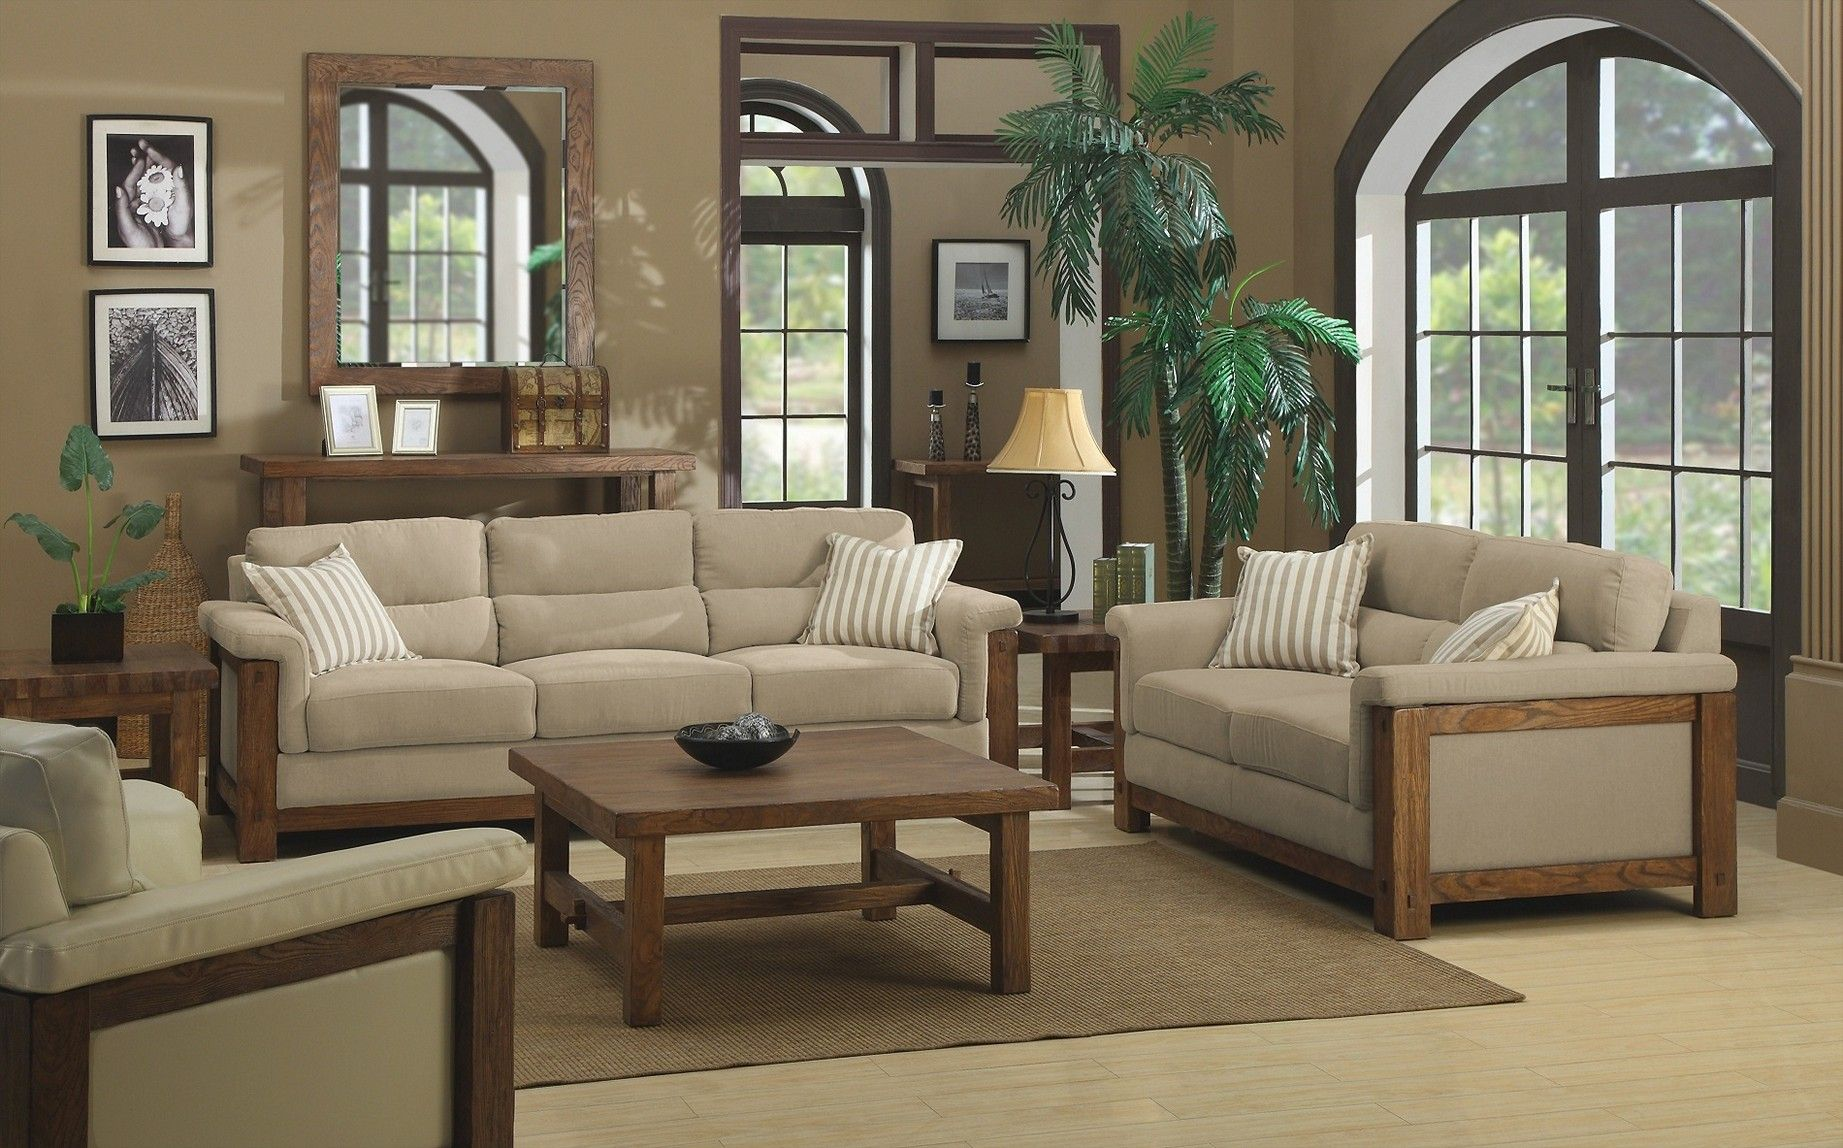 living room chair styles. Rustic Oak Living Room Furniture  Home comfort Pinterest